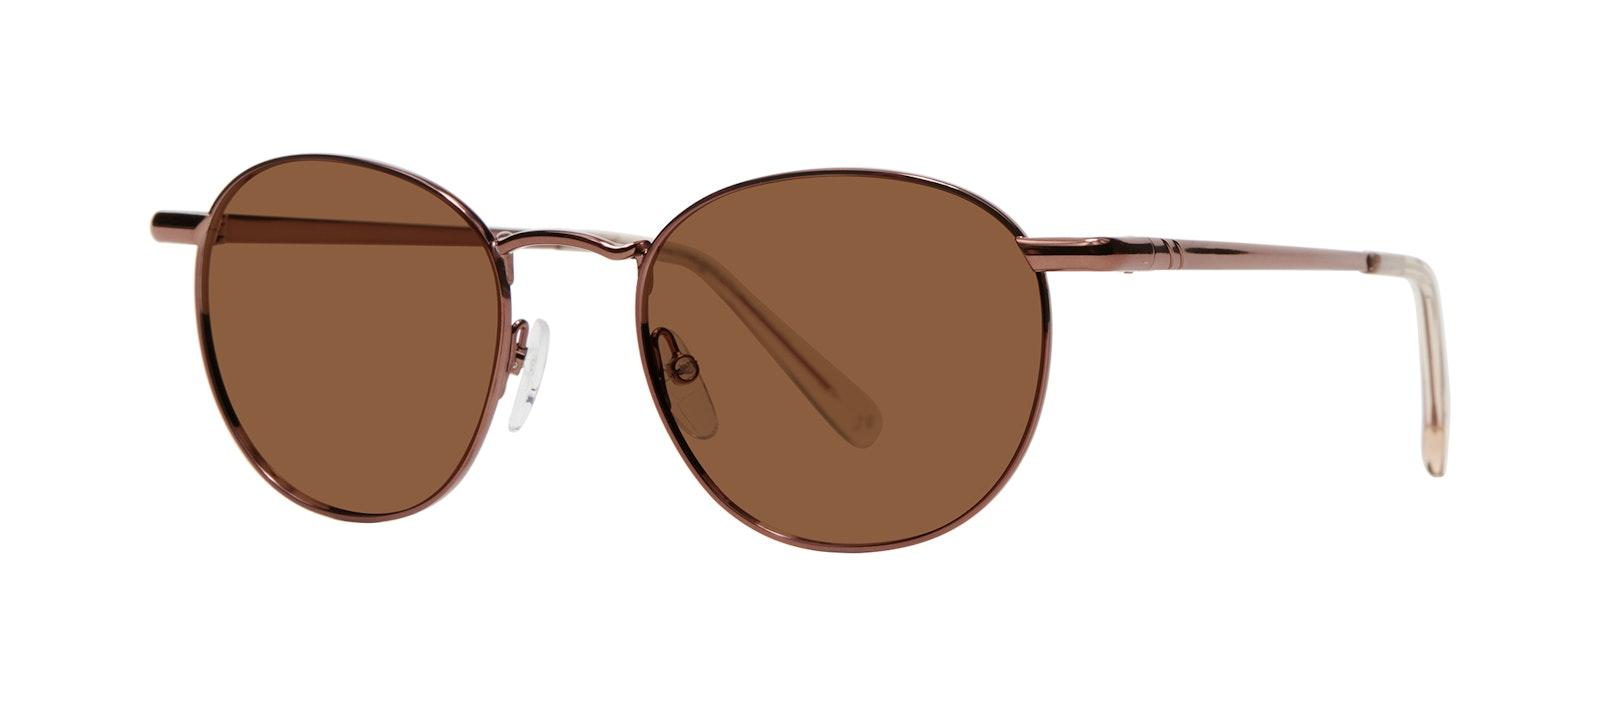 Affordable Fashion Glasses Round Sunglasses Men Women Divine L Copper Tilt